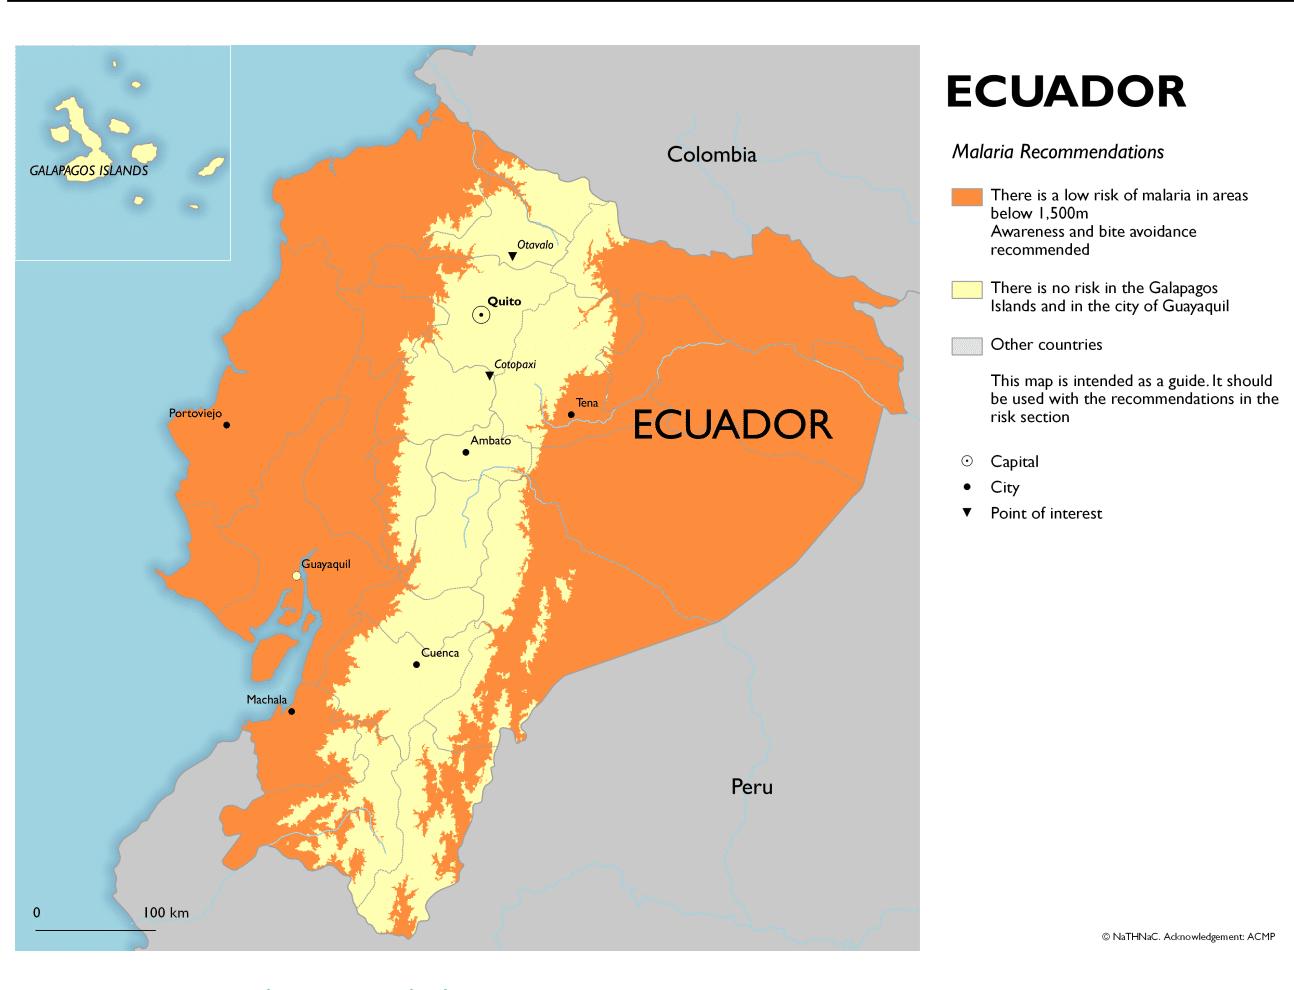 Diseases in Ecuador - Malaria